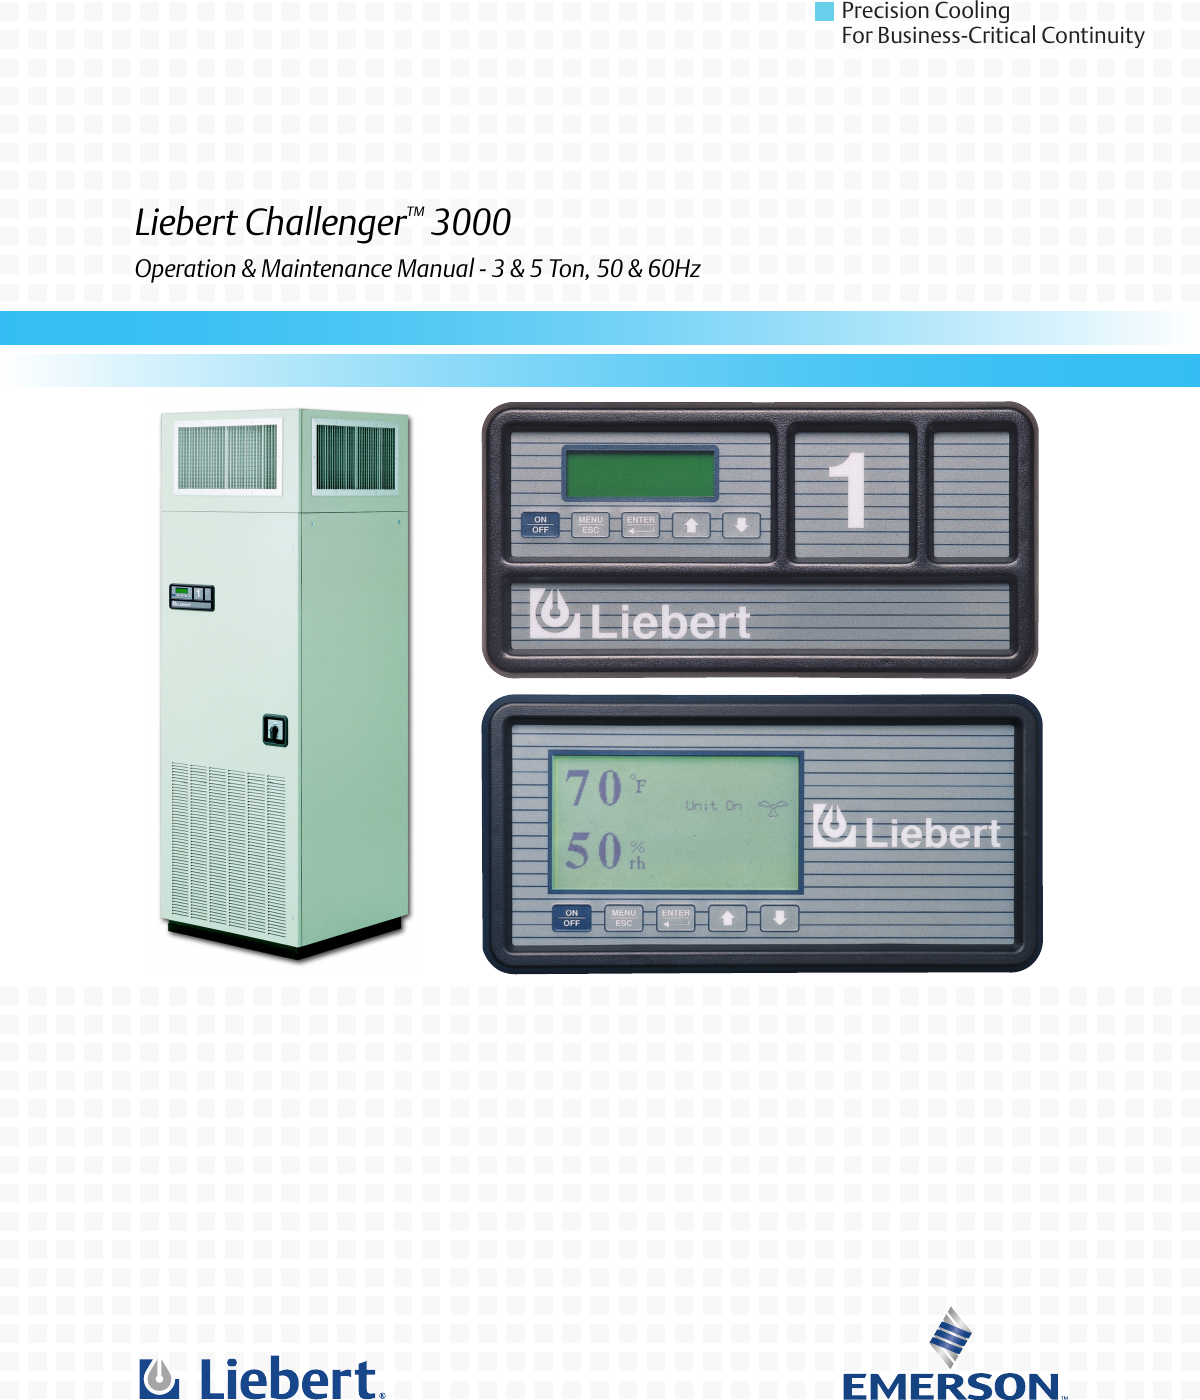 Liebert Challenger 3000 Wiring Diagram from usermanual.wiki